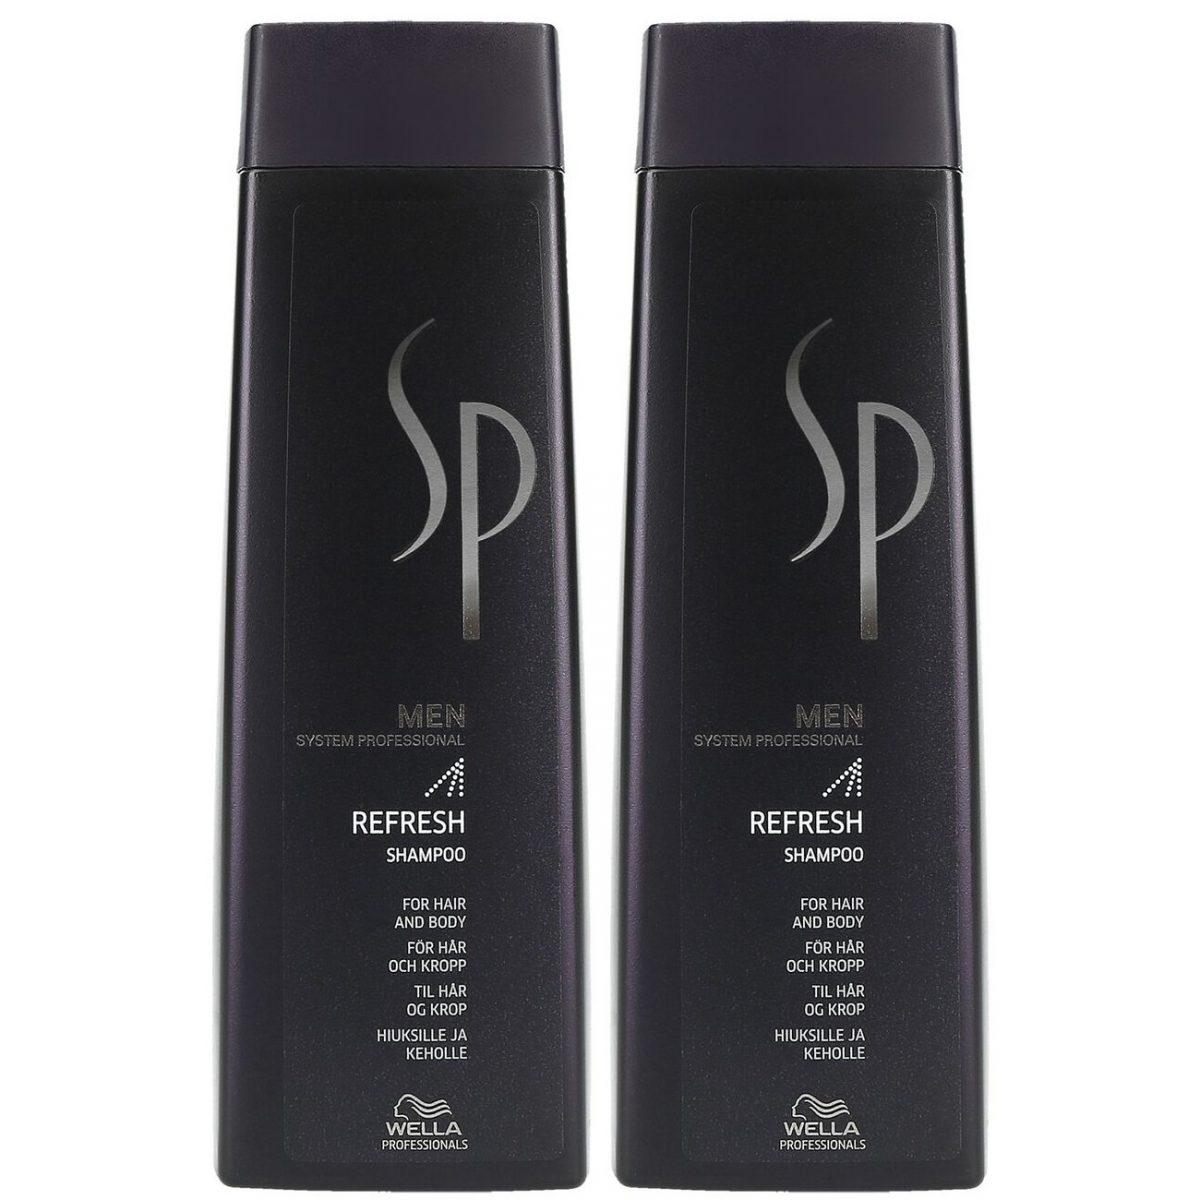 14_Emphase_Wella_SP_Duo_Refresh_Shampoo_250ml